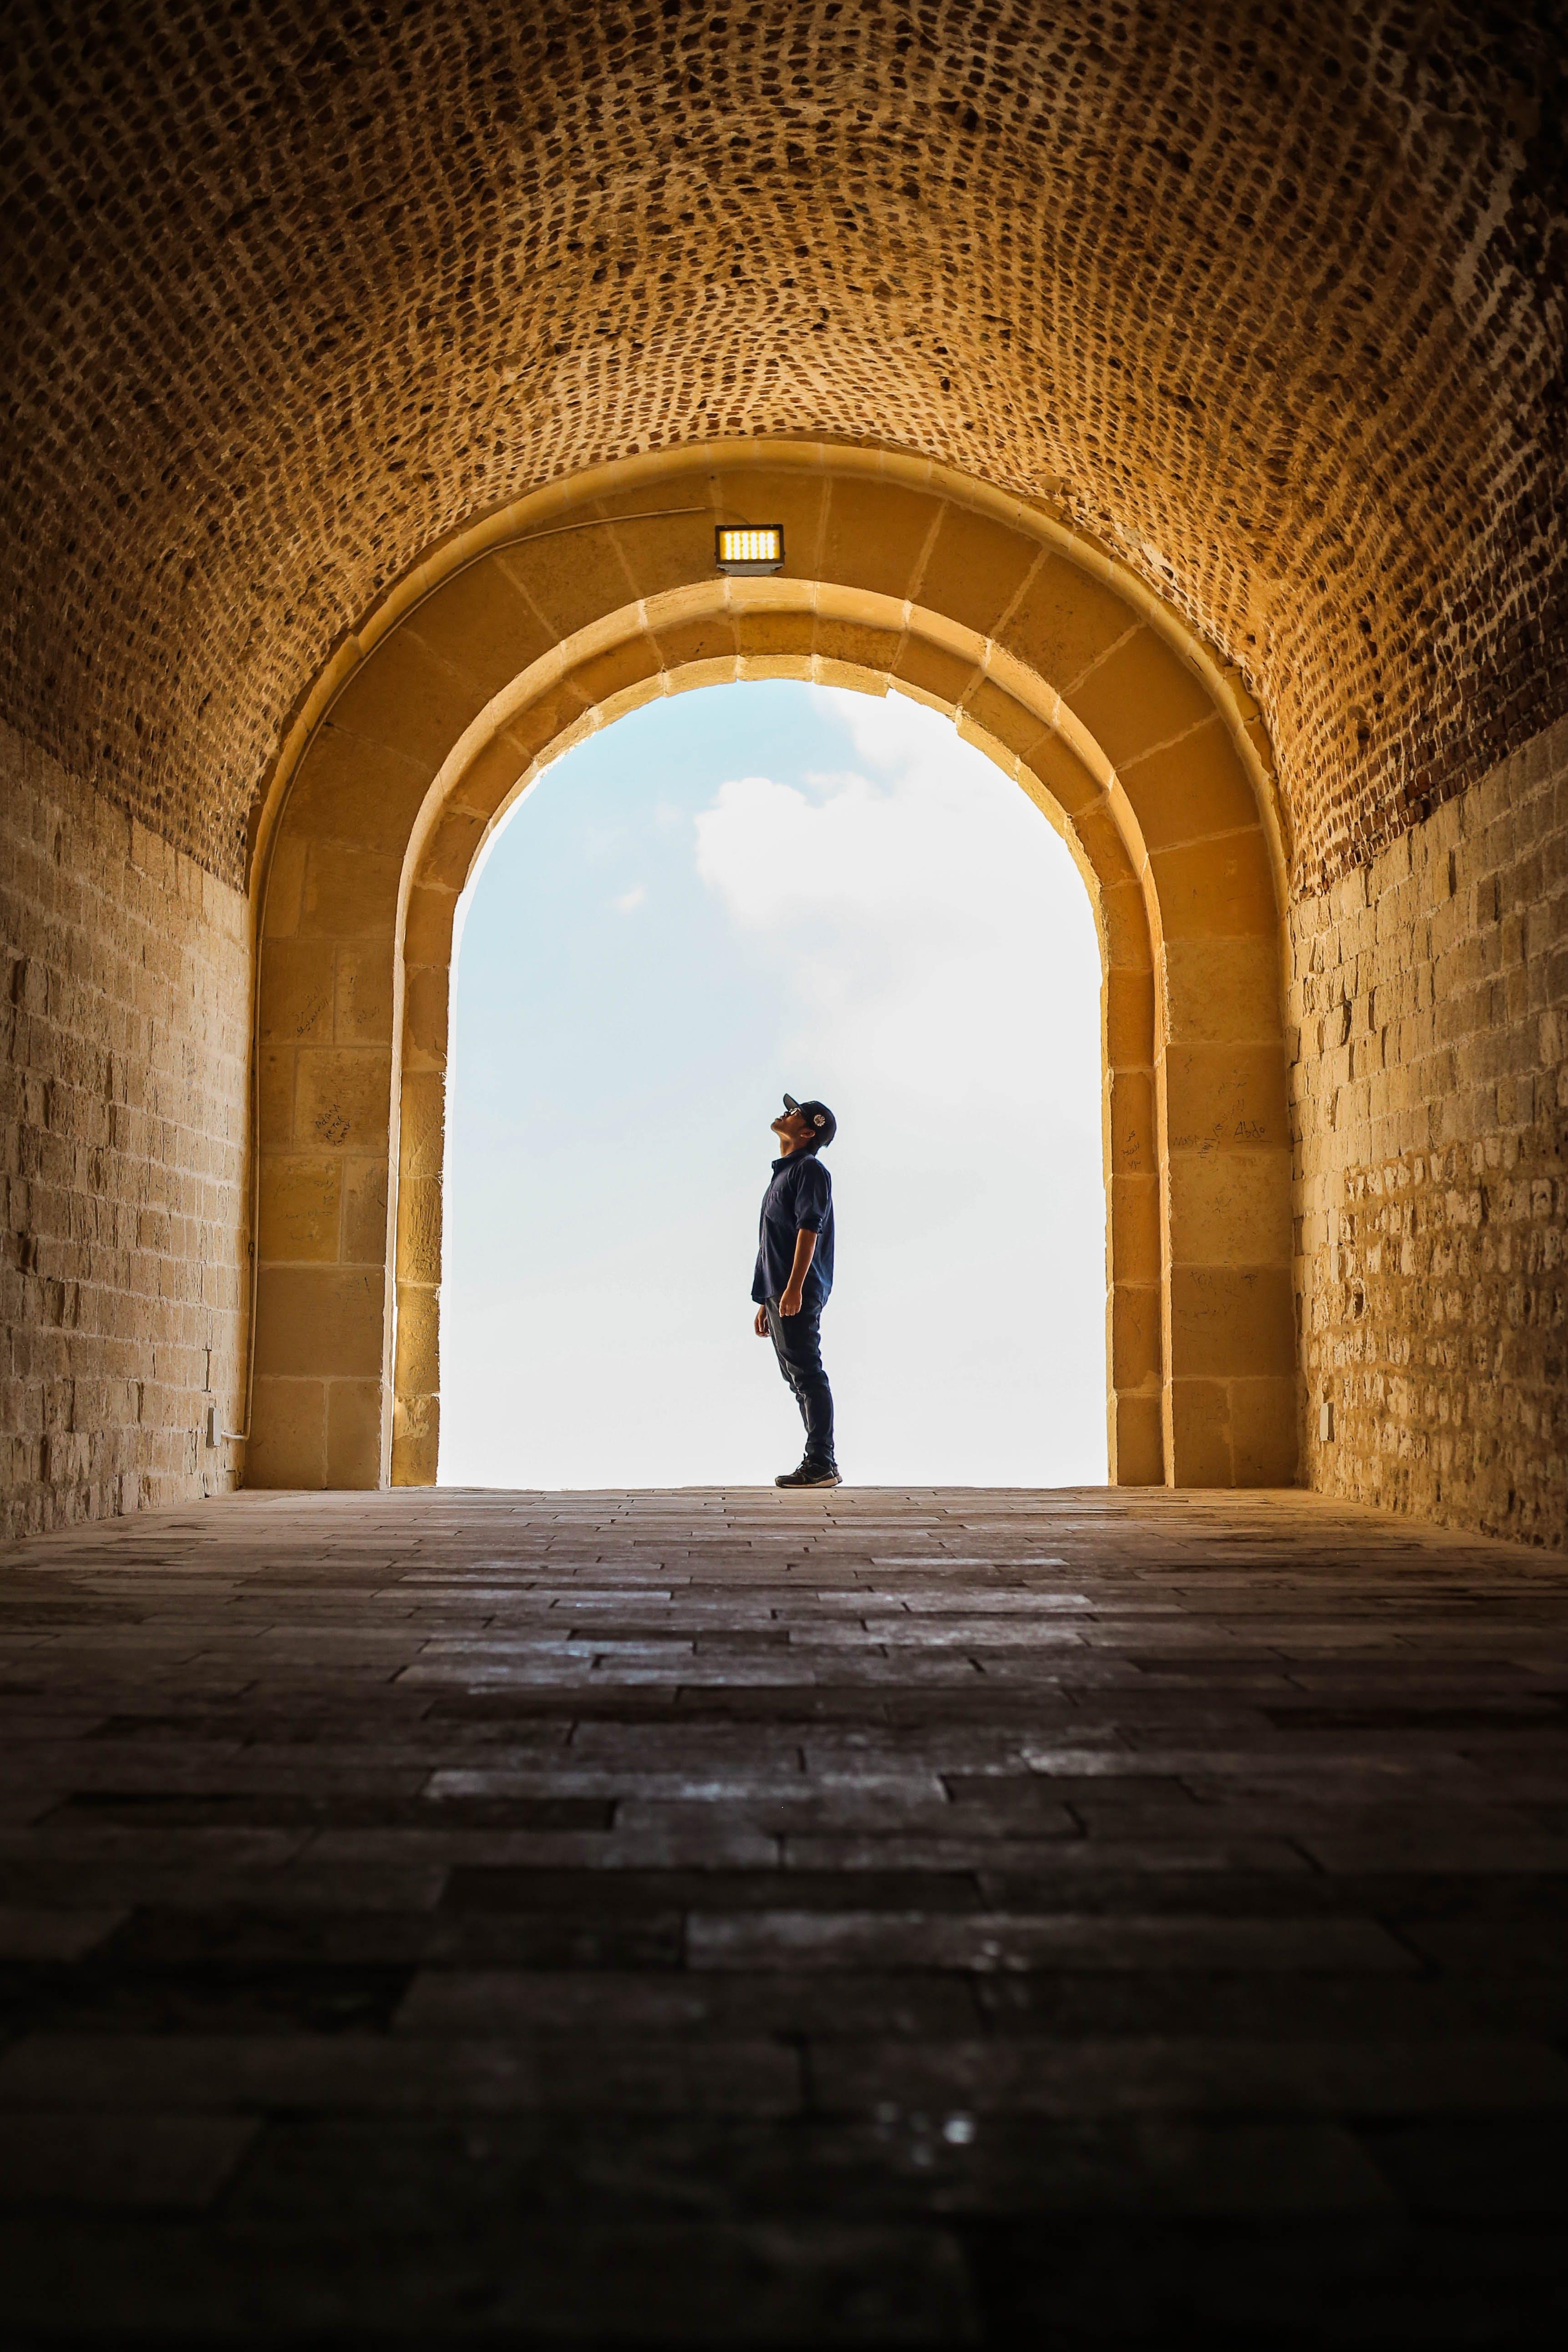 Man Standing Inside A Temple